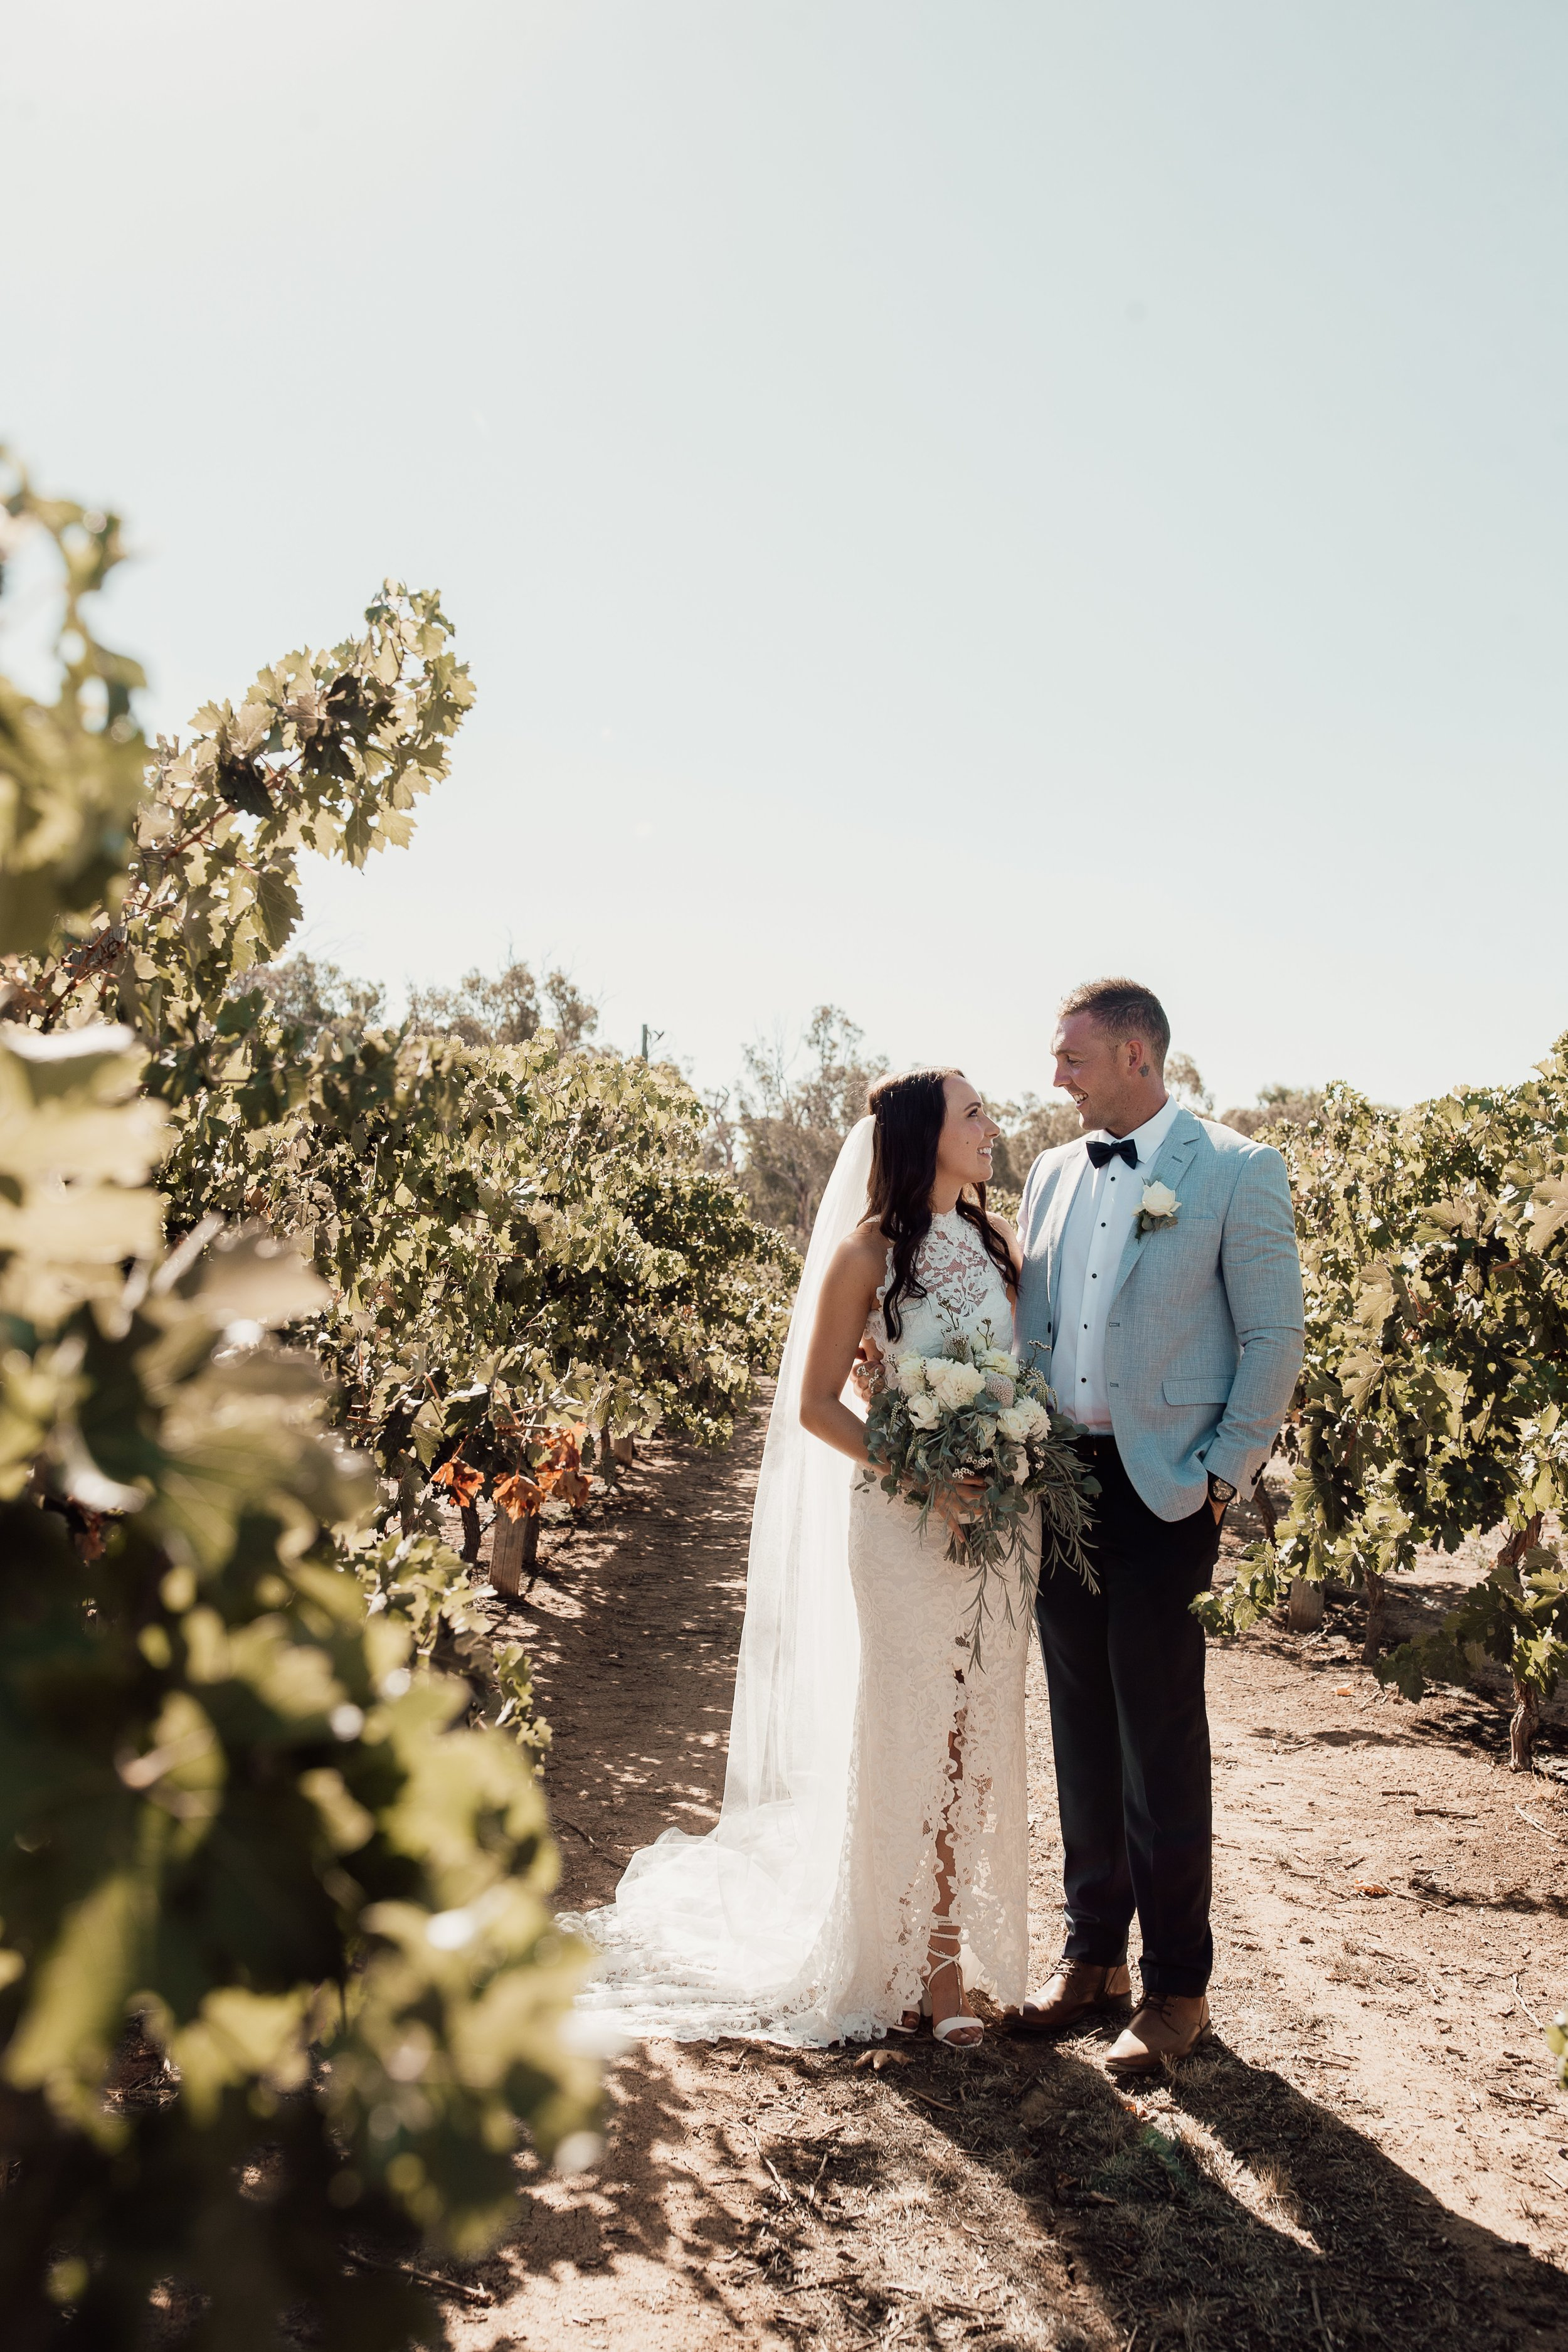 mickalathomas_puremacphotography_weddingphotographer_couplephotographer_Sheppartonphotographer_2899.jpg